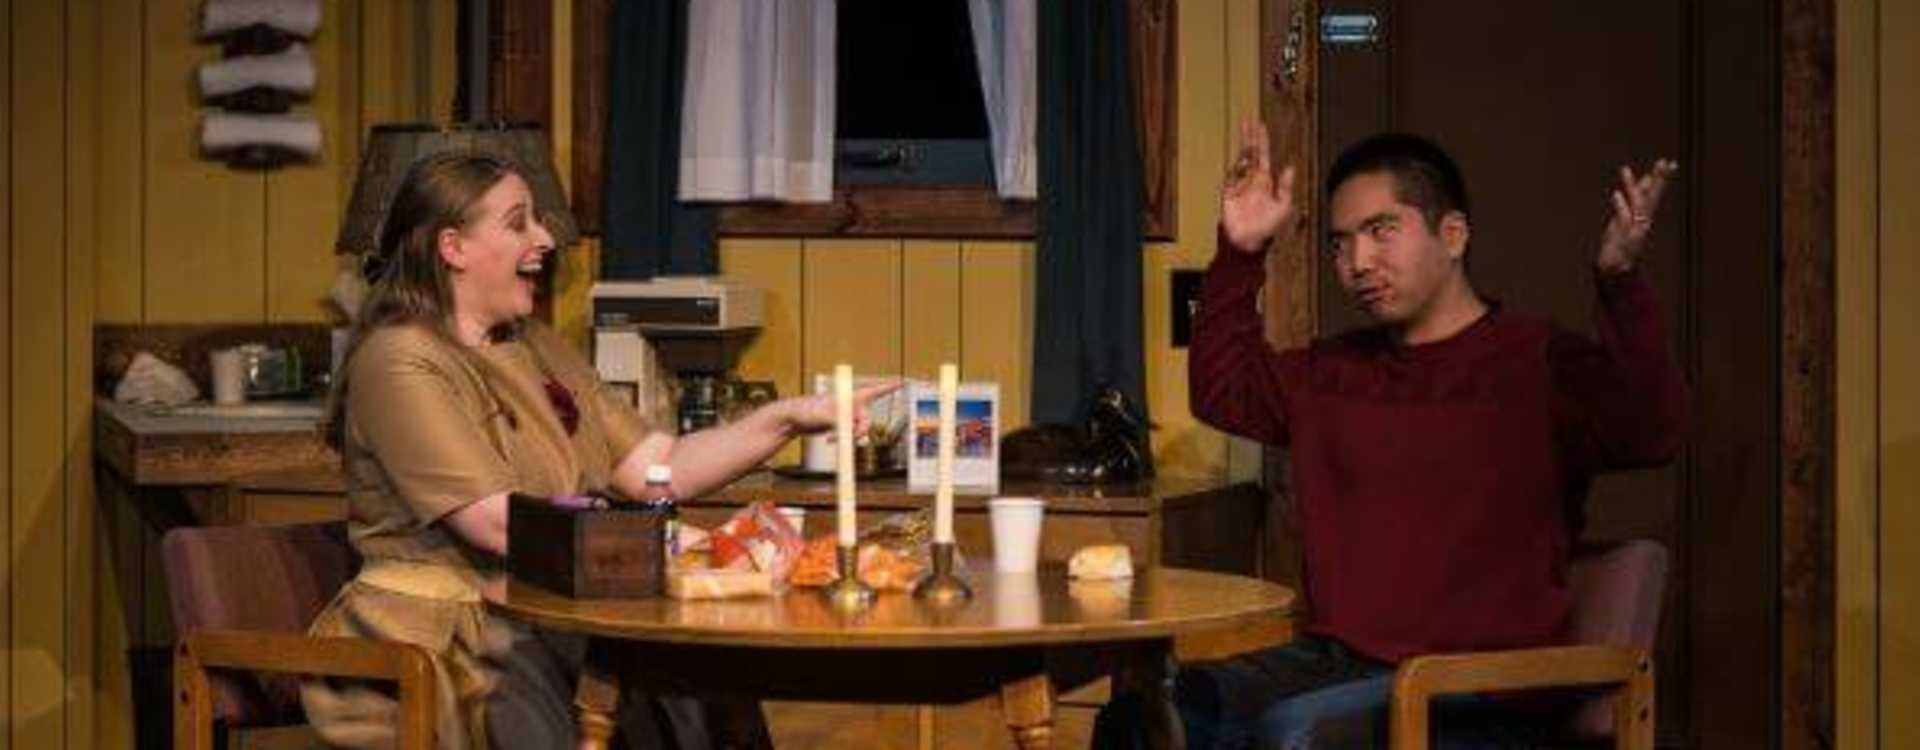 Burien Actors Theatre productions